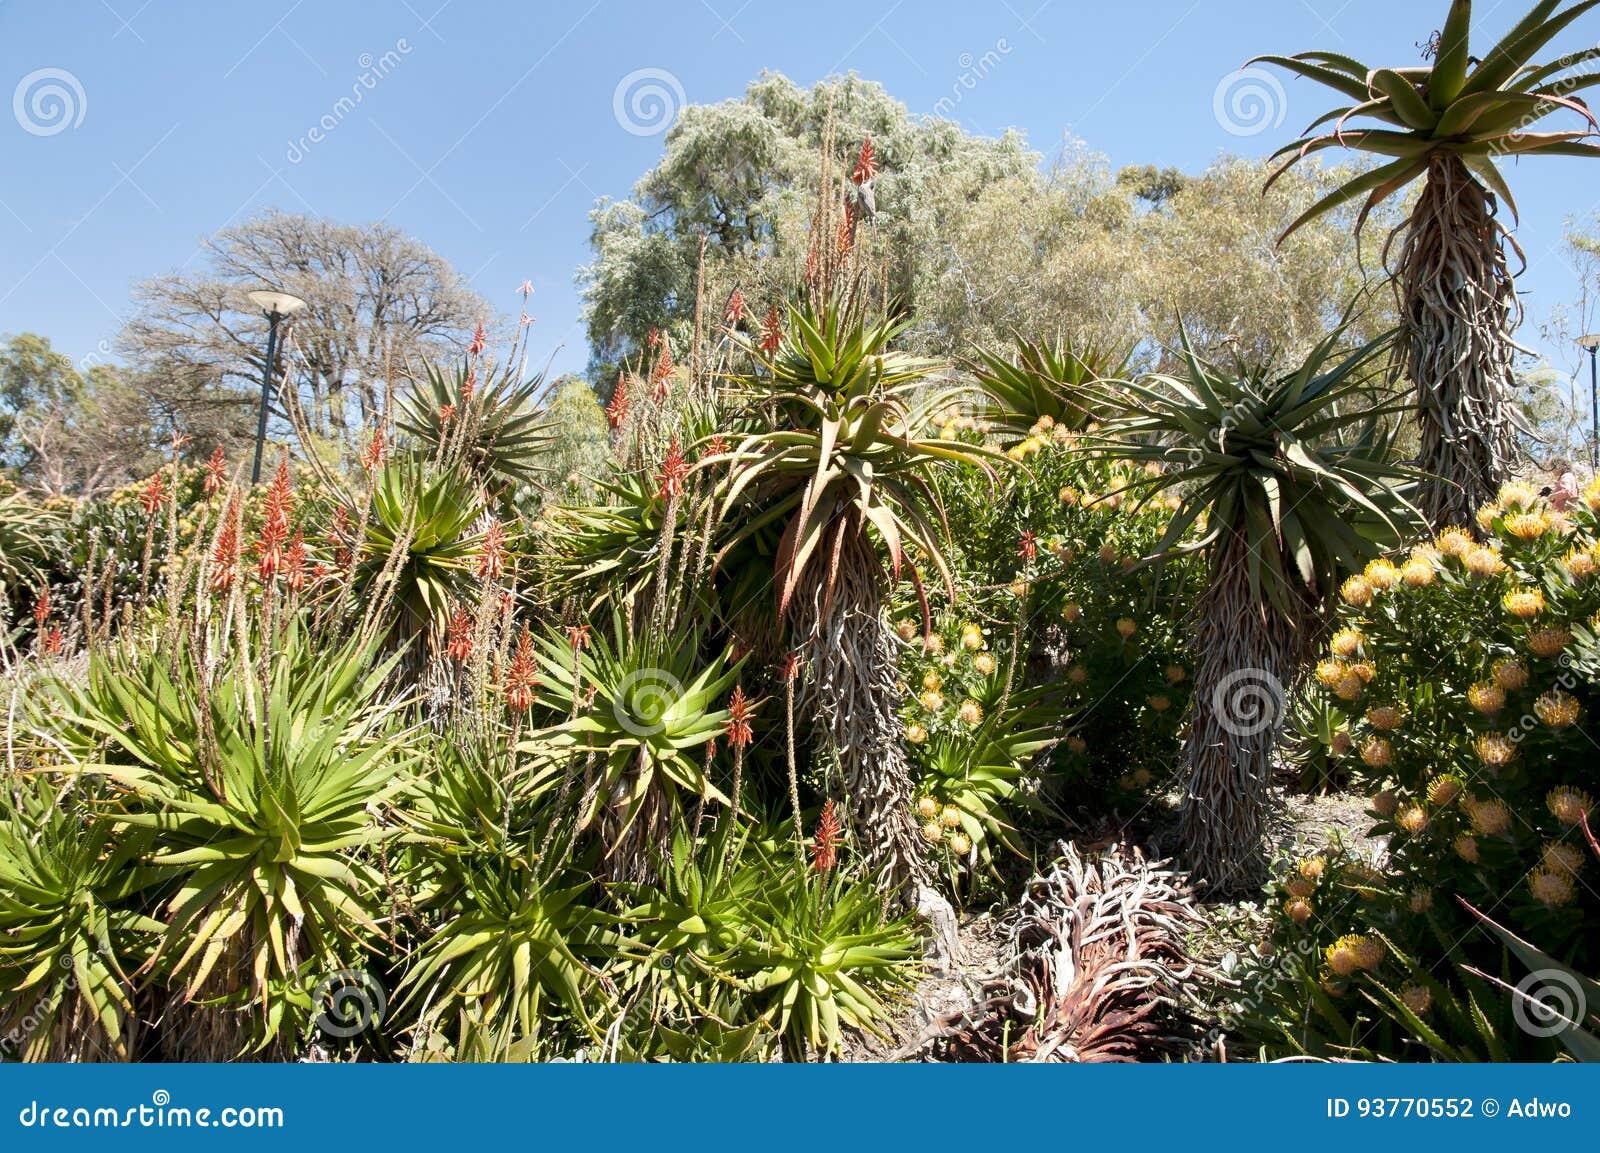 Re Park - Perth - Australia